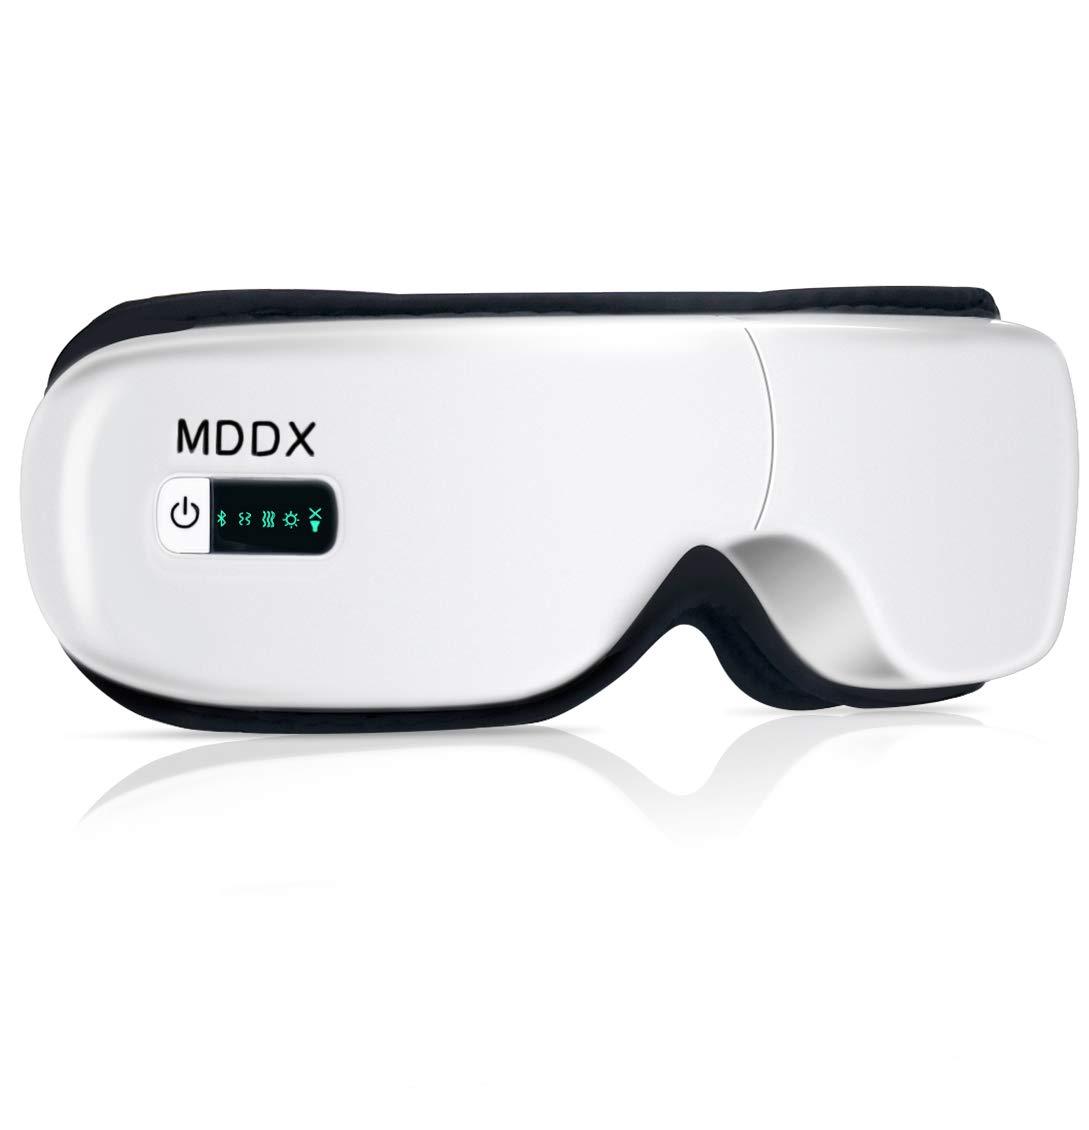 MDDX アイマッサージャー